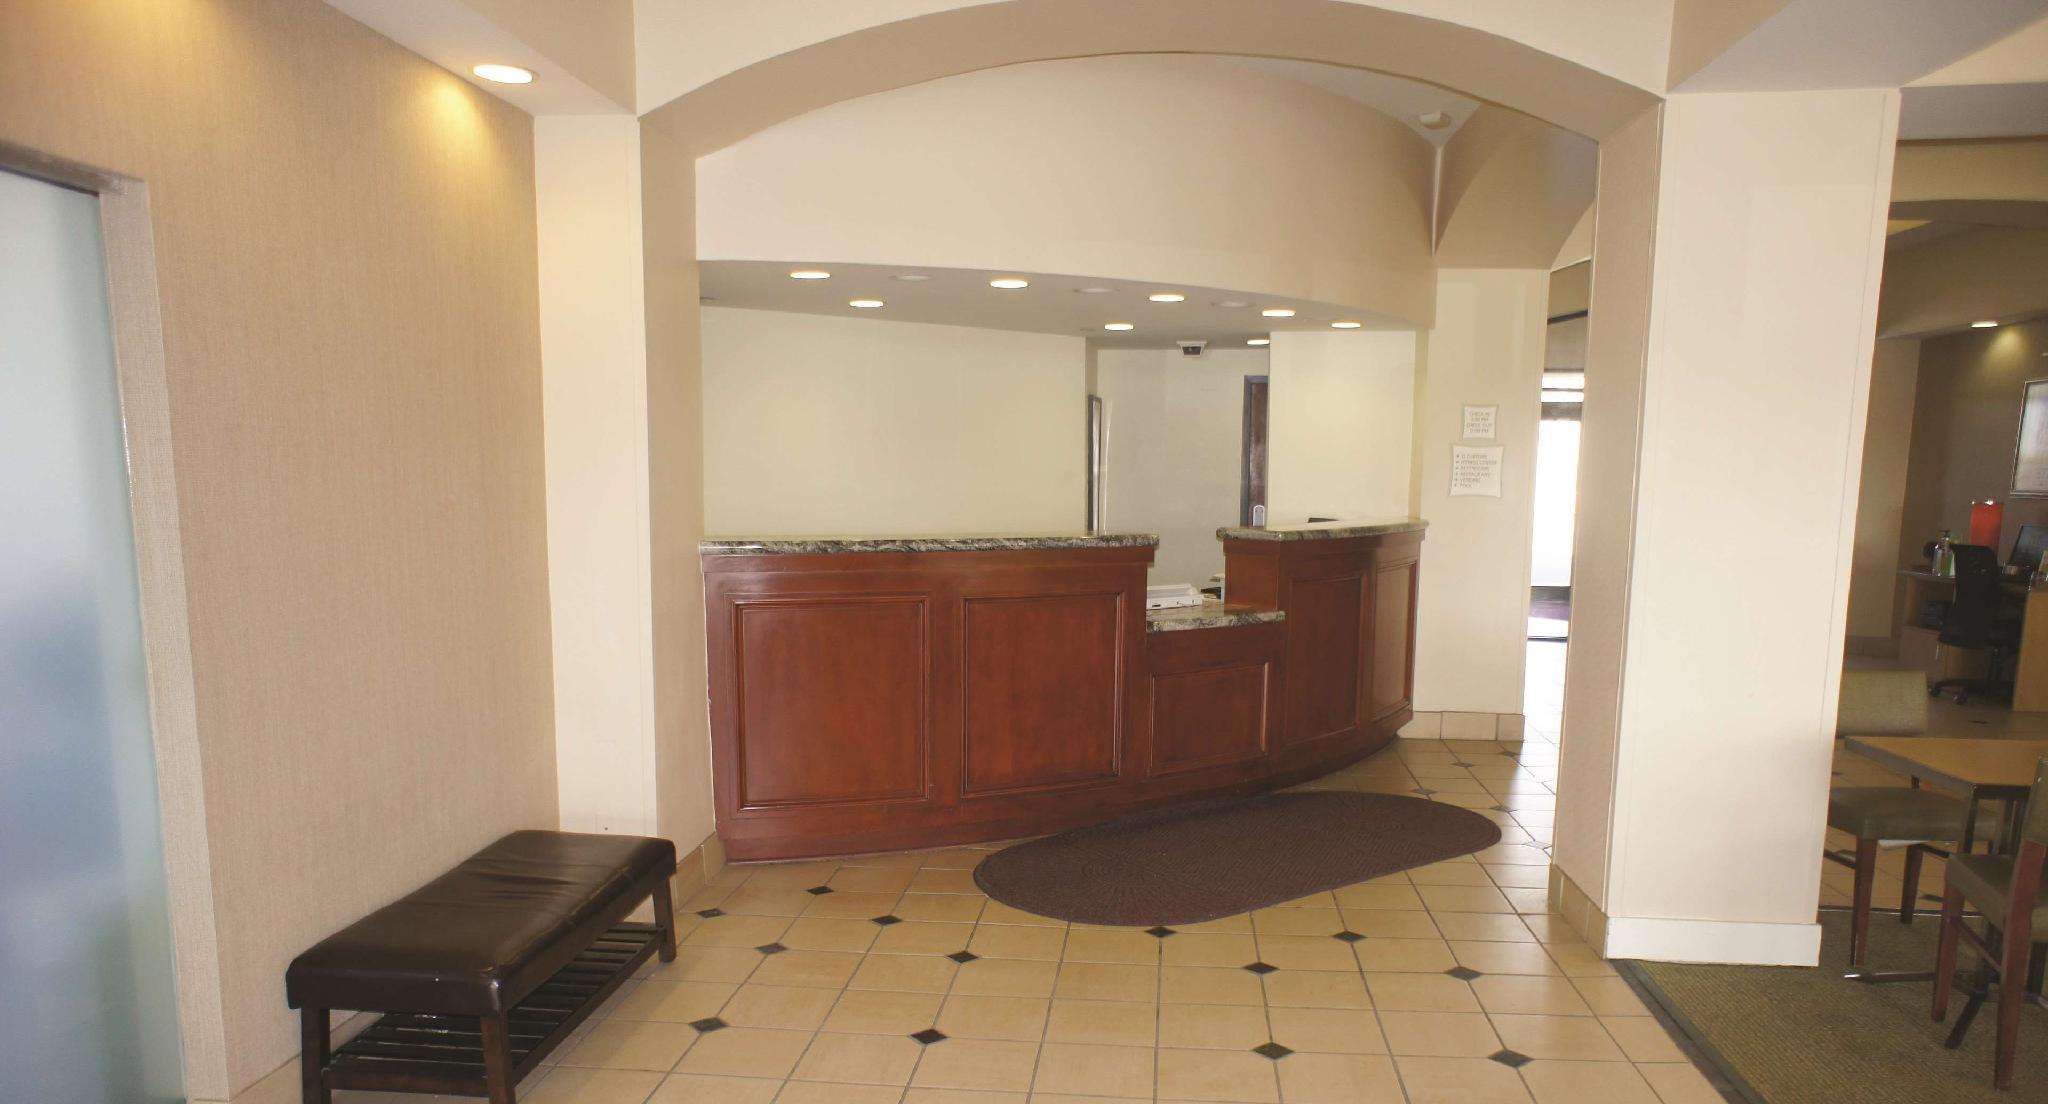 La Quinta Inn & Suites by Wyndham New Haven, New Haven